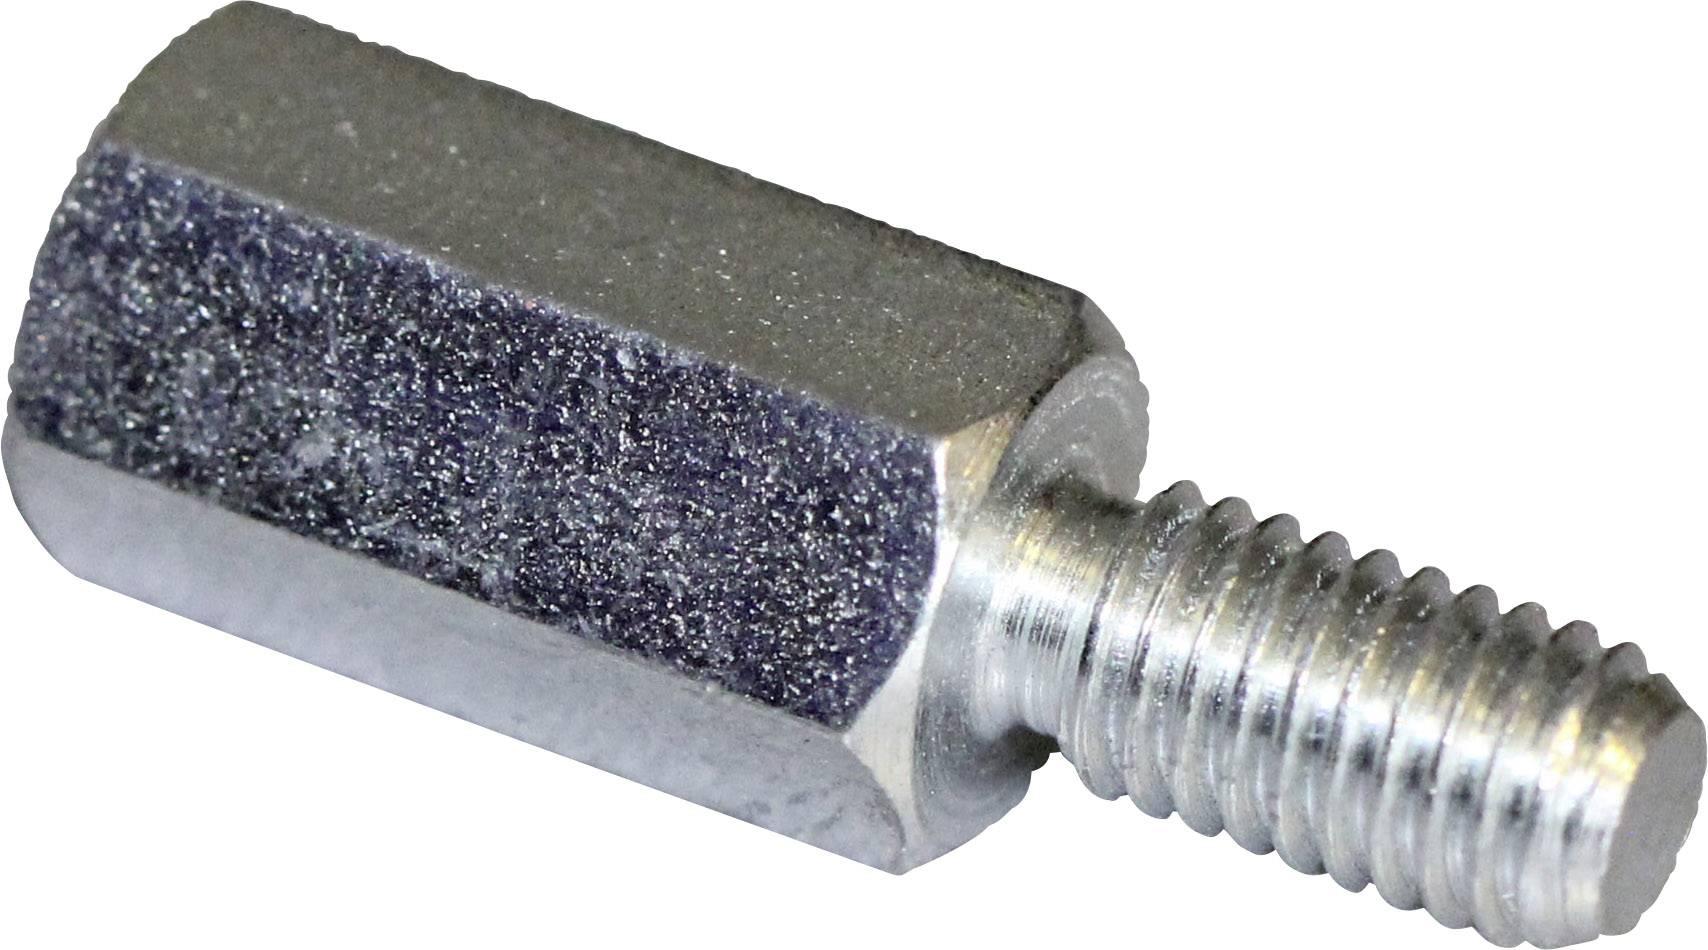 10er PACK Rastbolzen d1 5 mm d2 M 10 x 1 mm l1 5 mm Stahl Stk ohne Rastsperre,